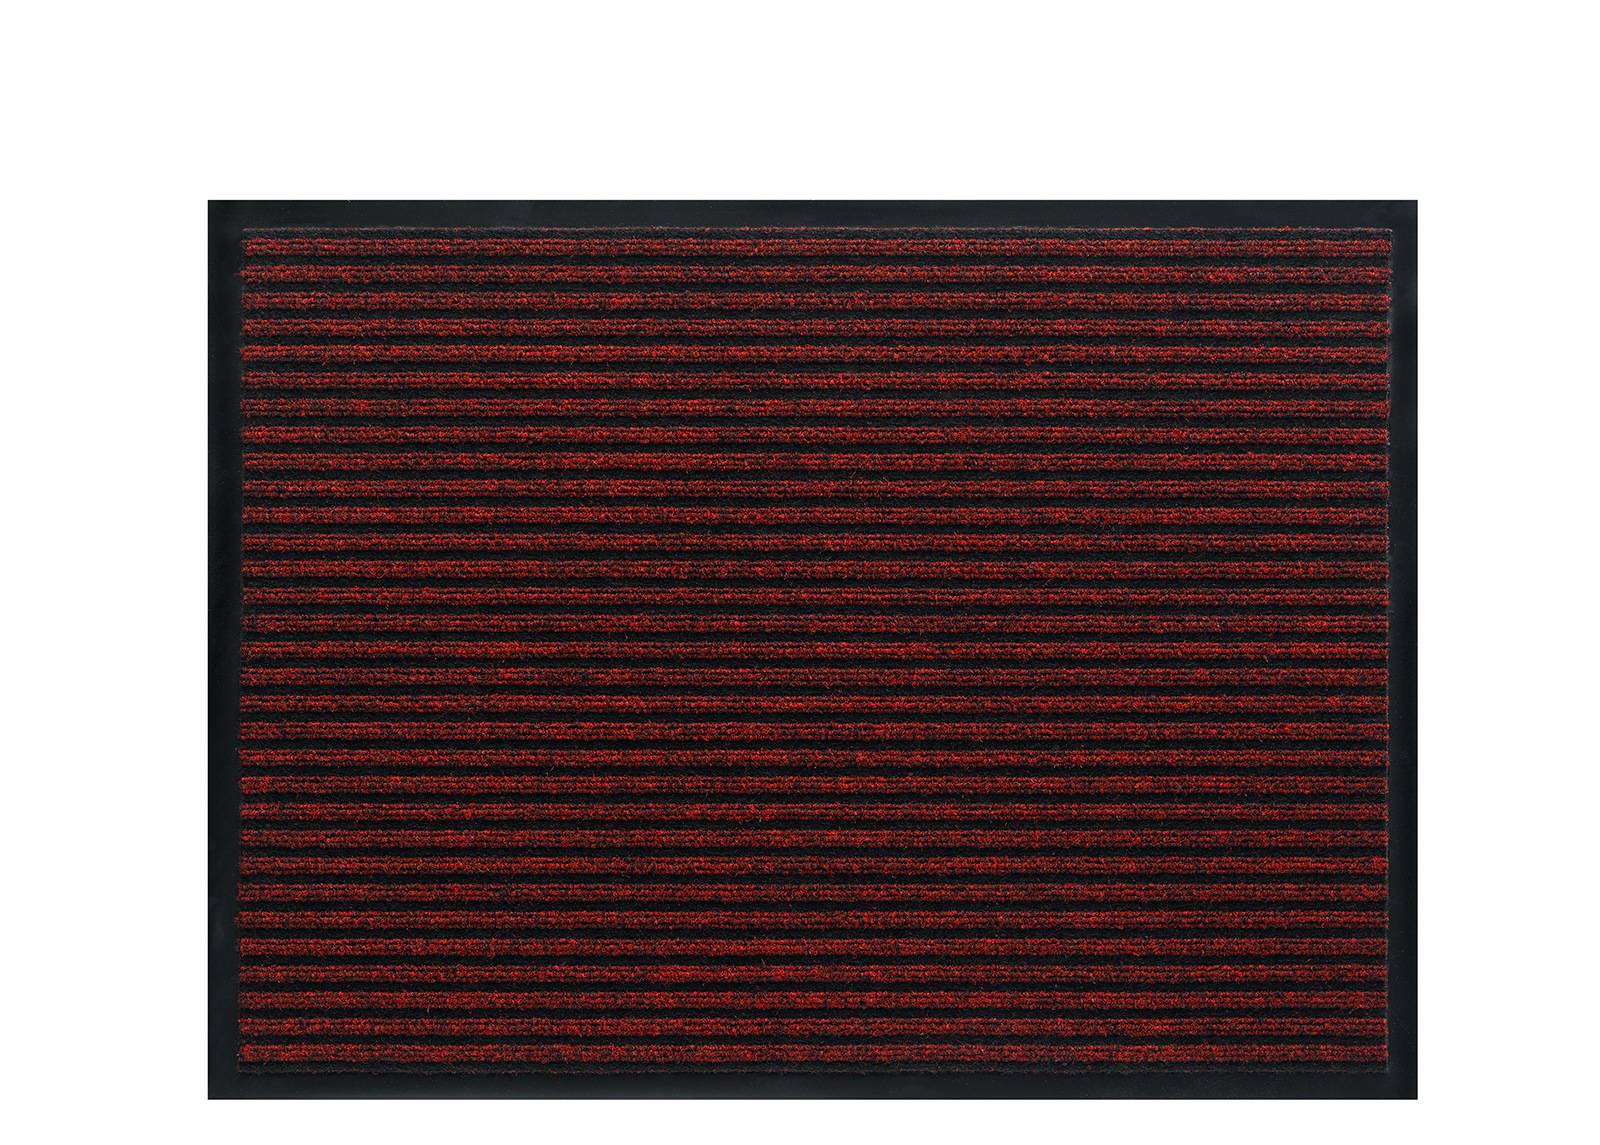 Hamat Eteismatto EVERTON 60x80 cm